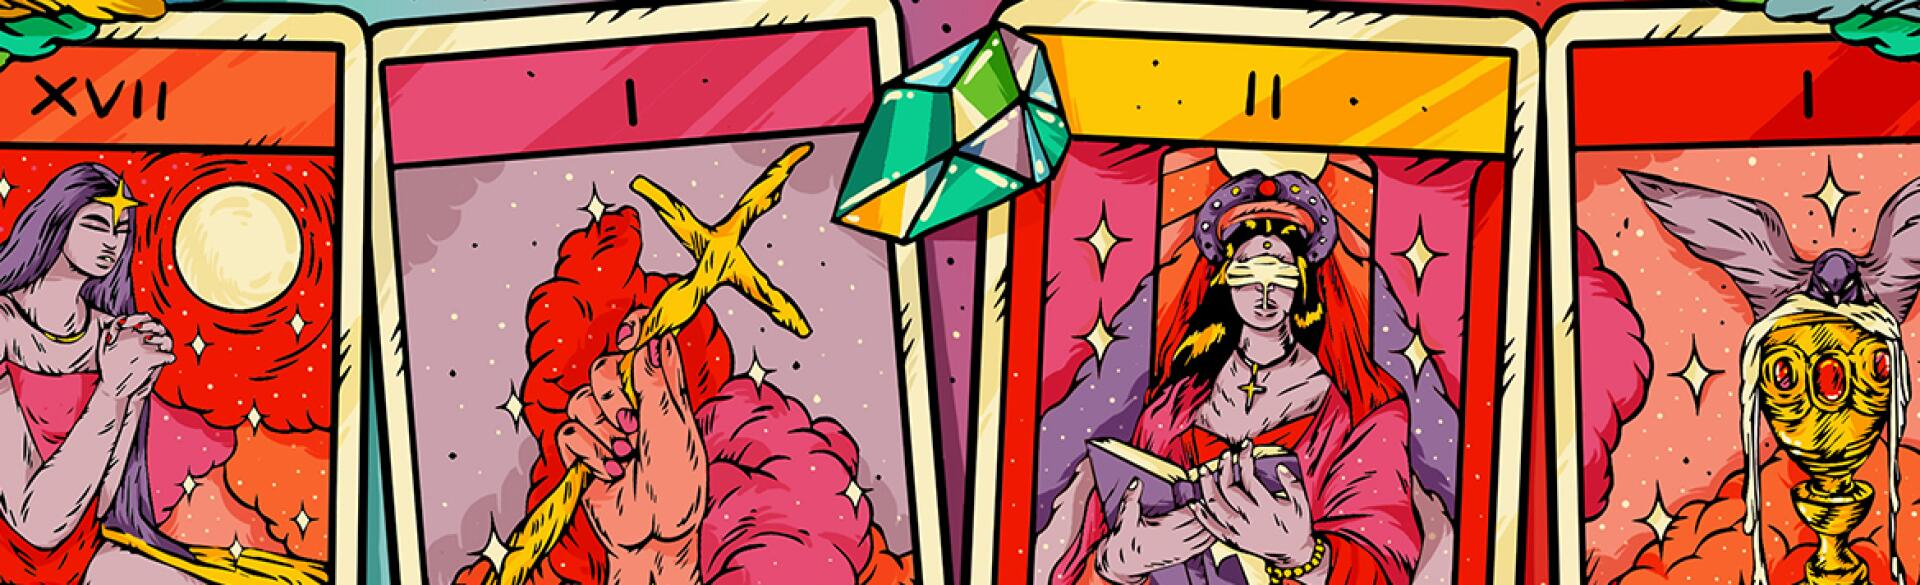 illustration_of_tarot_cards_by_noopur_choksi_1440x584_.jpg